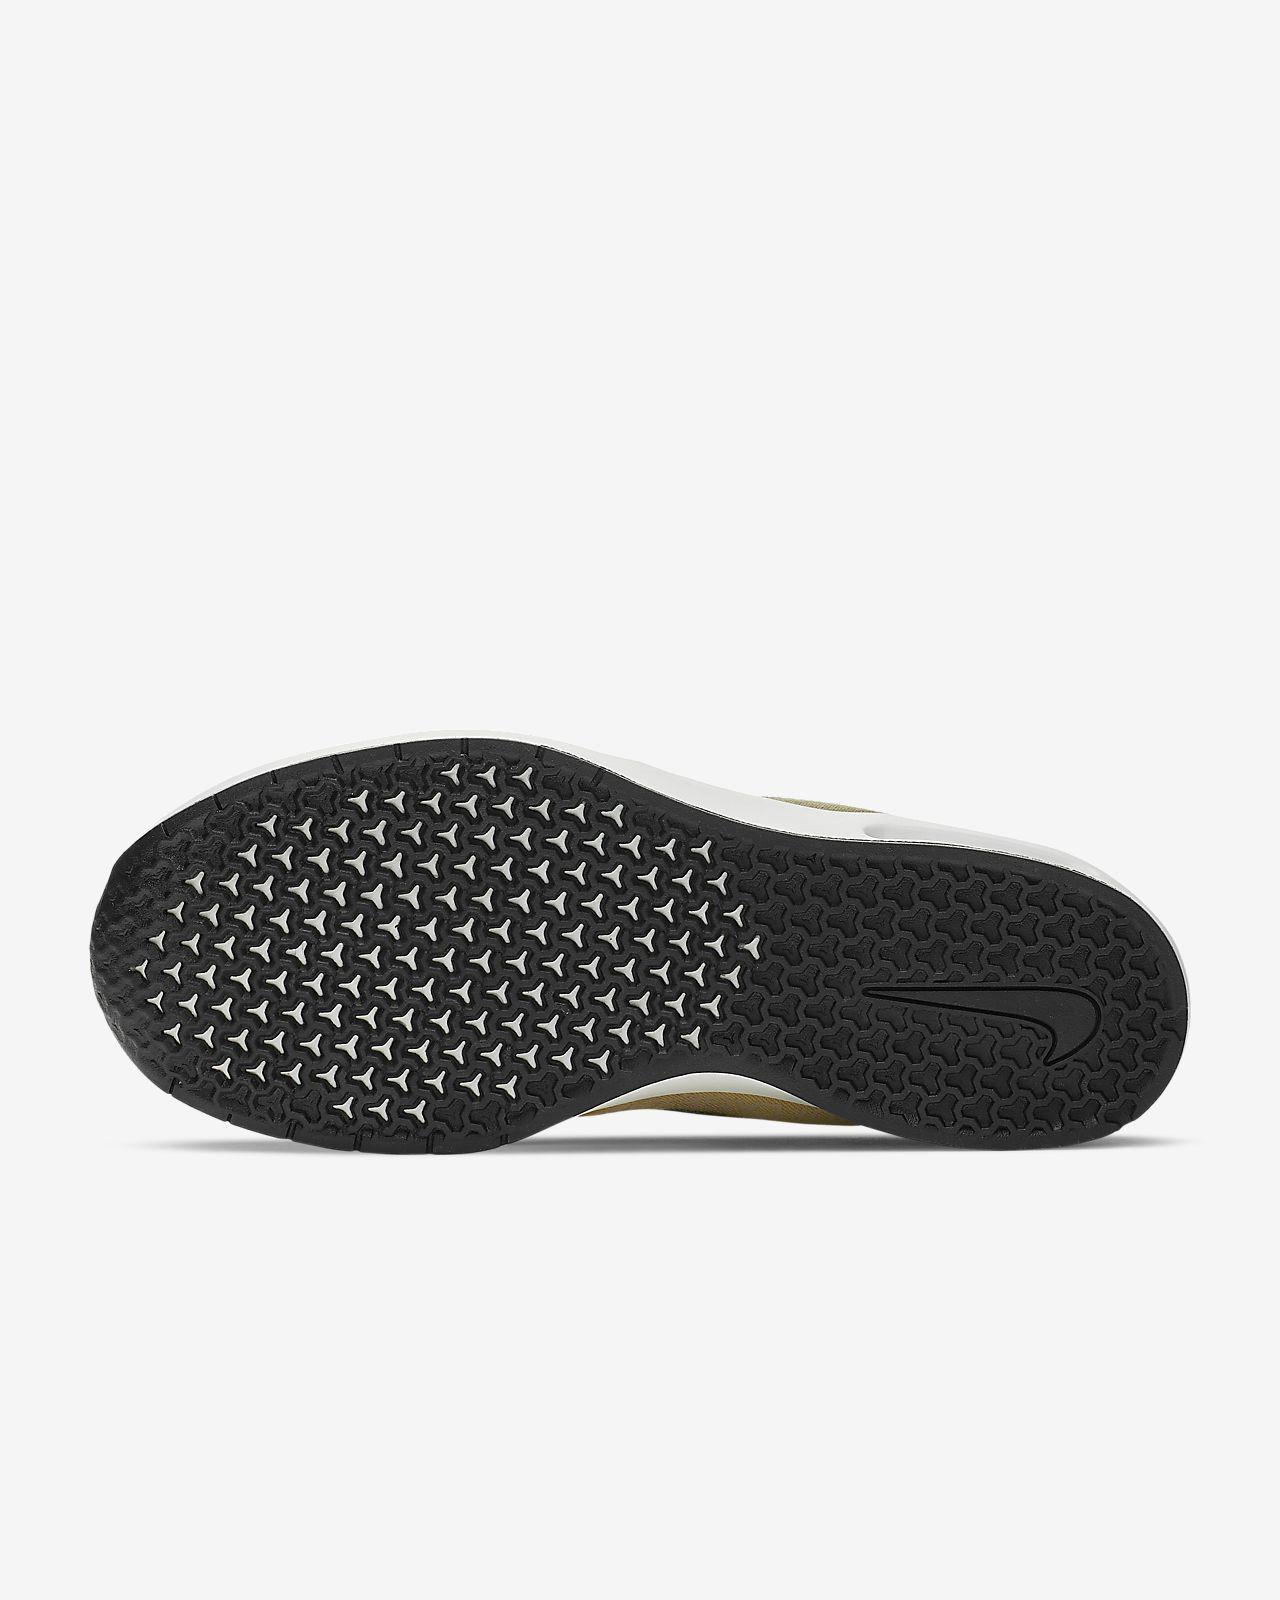 Skateboardsko Nike SB Air Max Stefan Janoski 2 Premium